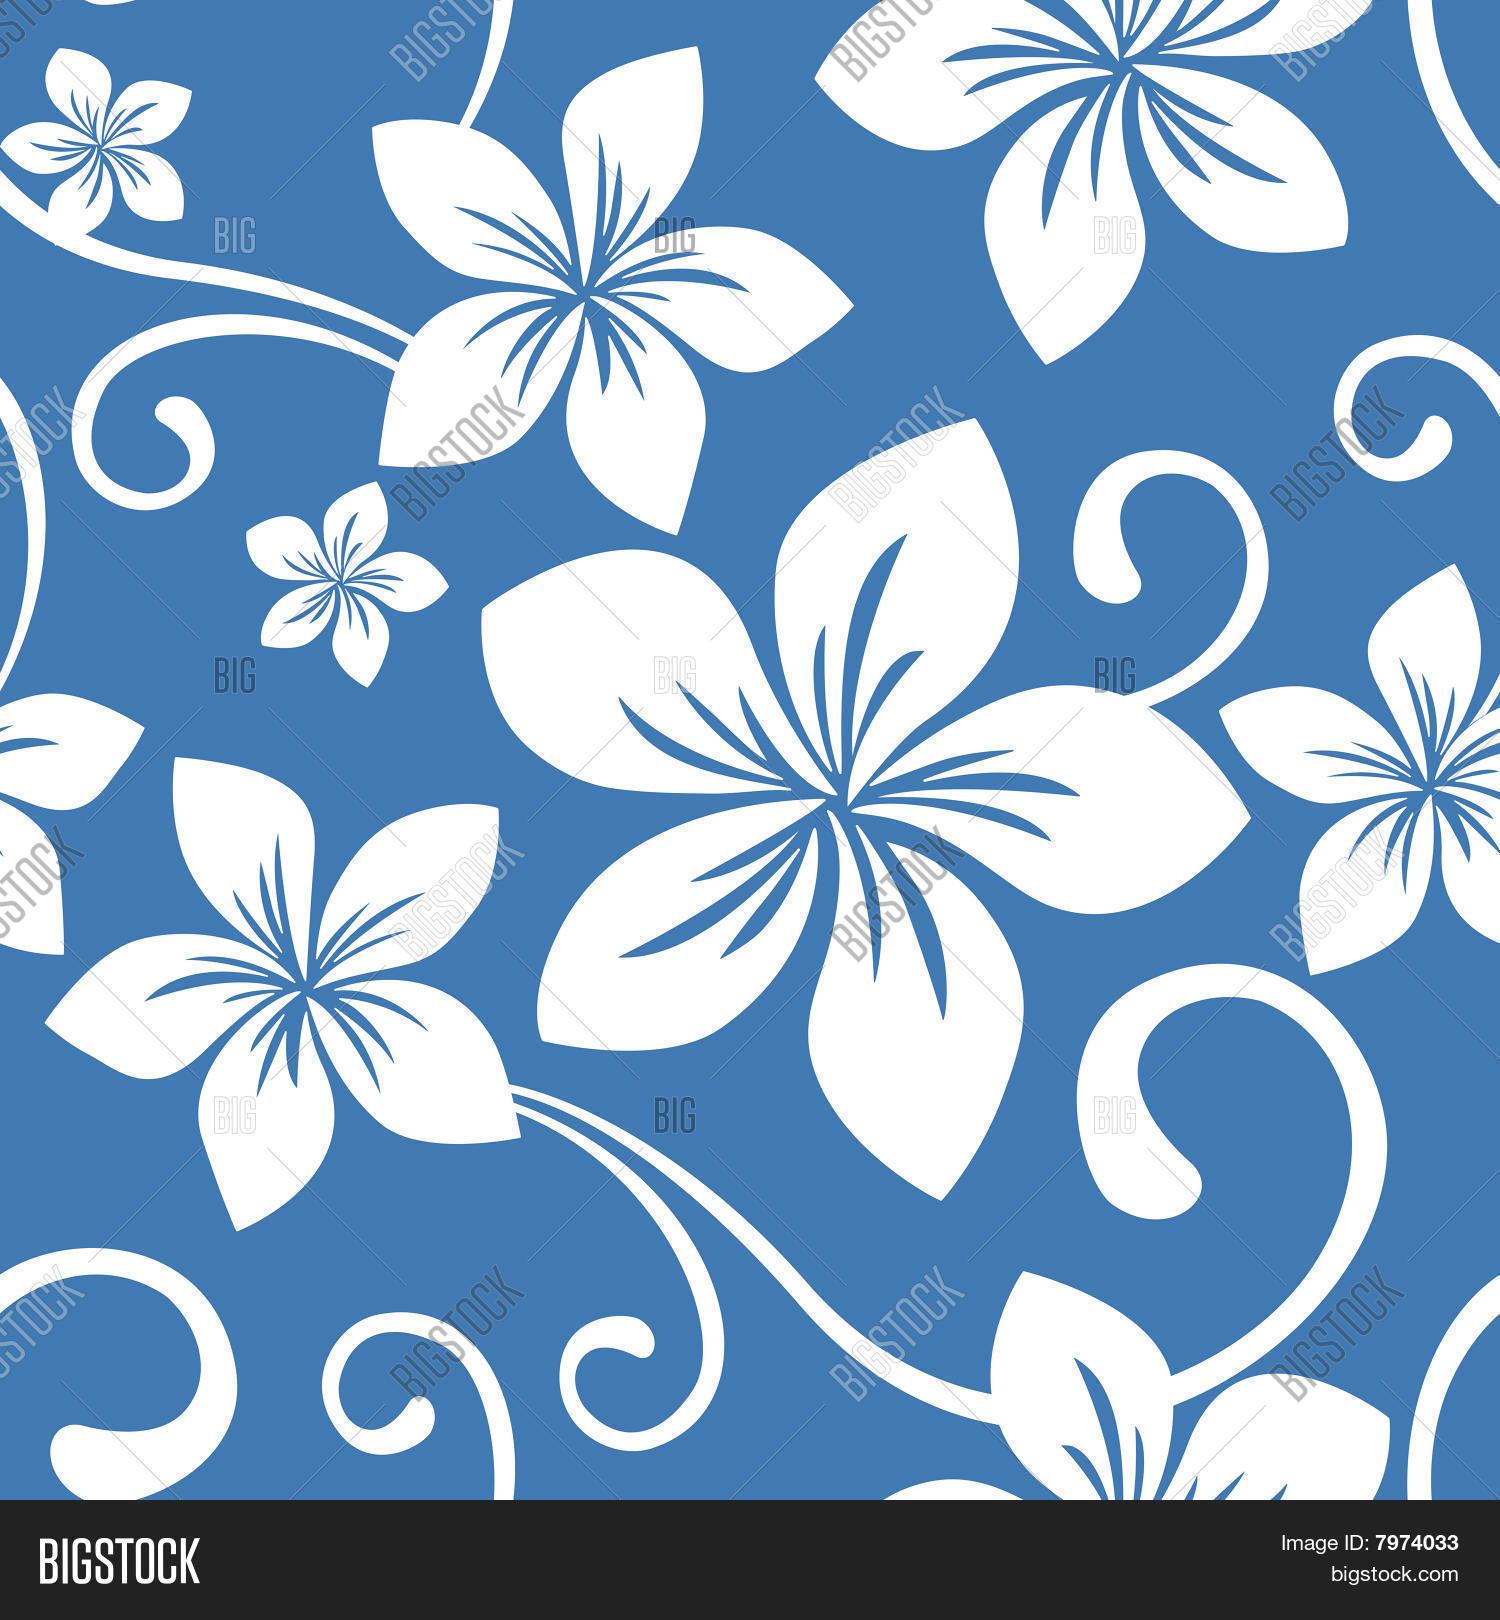 Seamless blue hawaii pattern vector photo bigstock seamless blue hawaii pattern izmirmasajfo Images